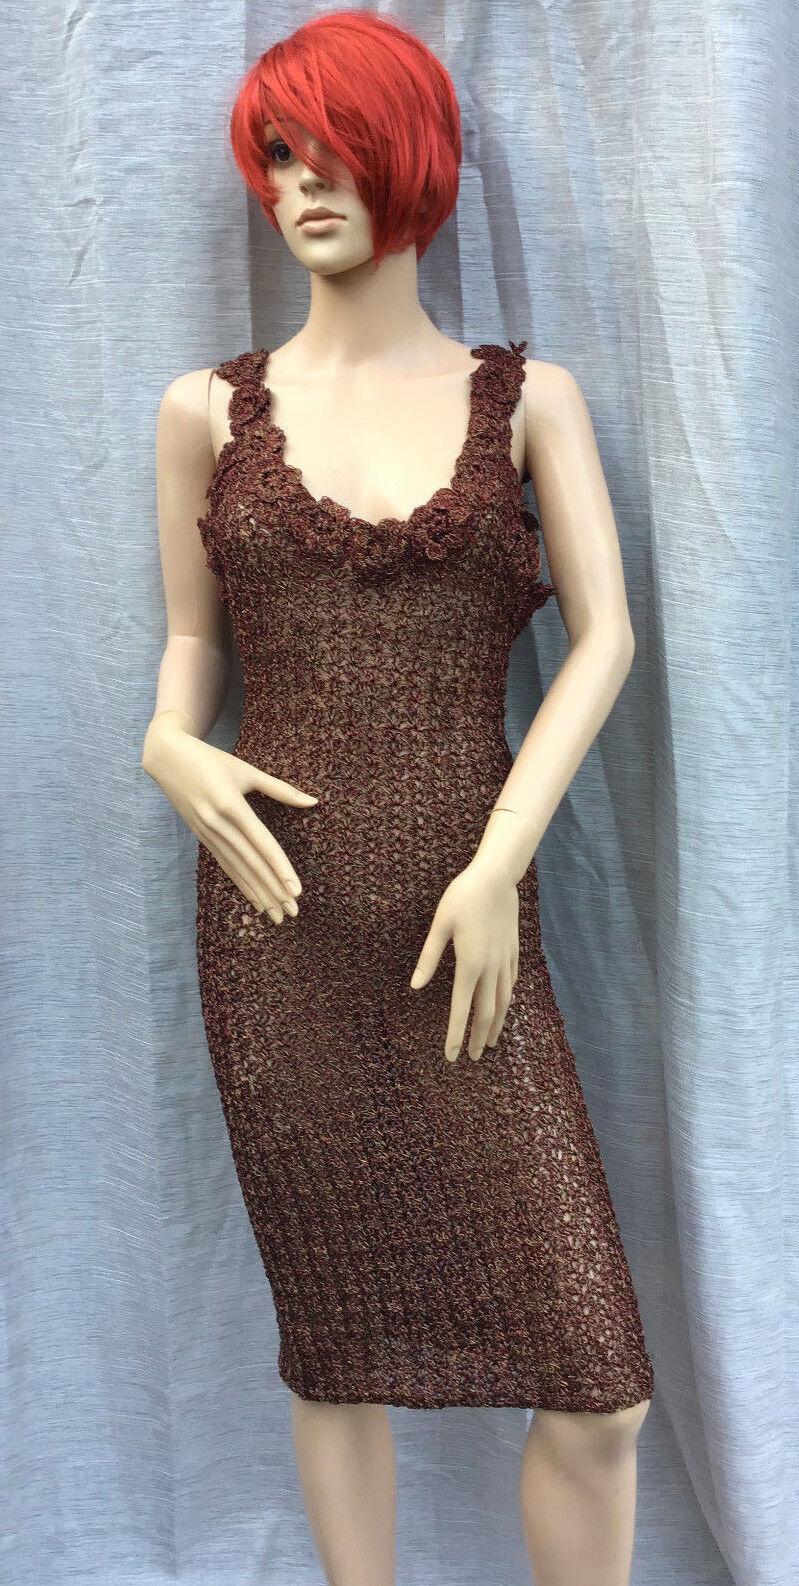 Lainey HAND Knit in Irlanda oro Marronee rosso Thread Abito